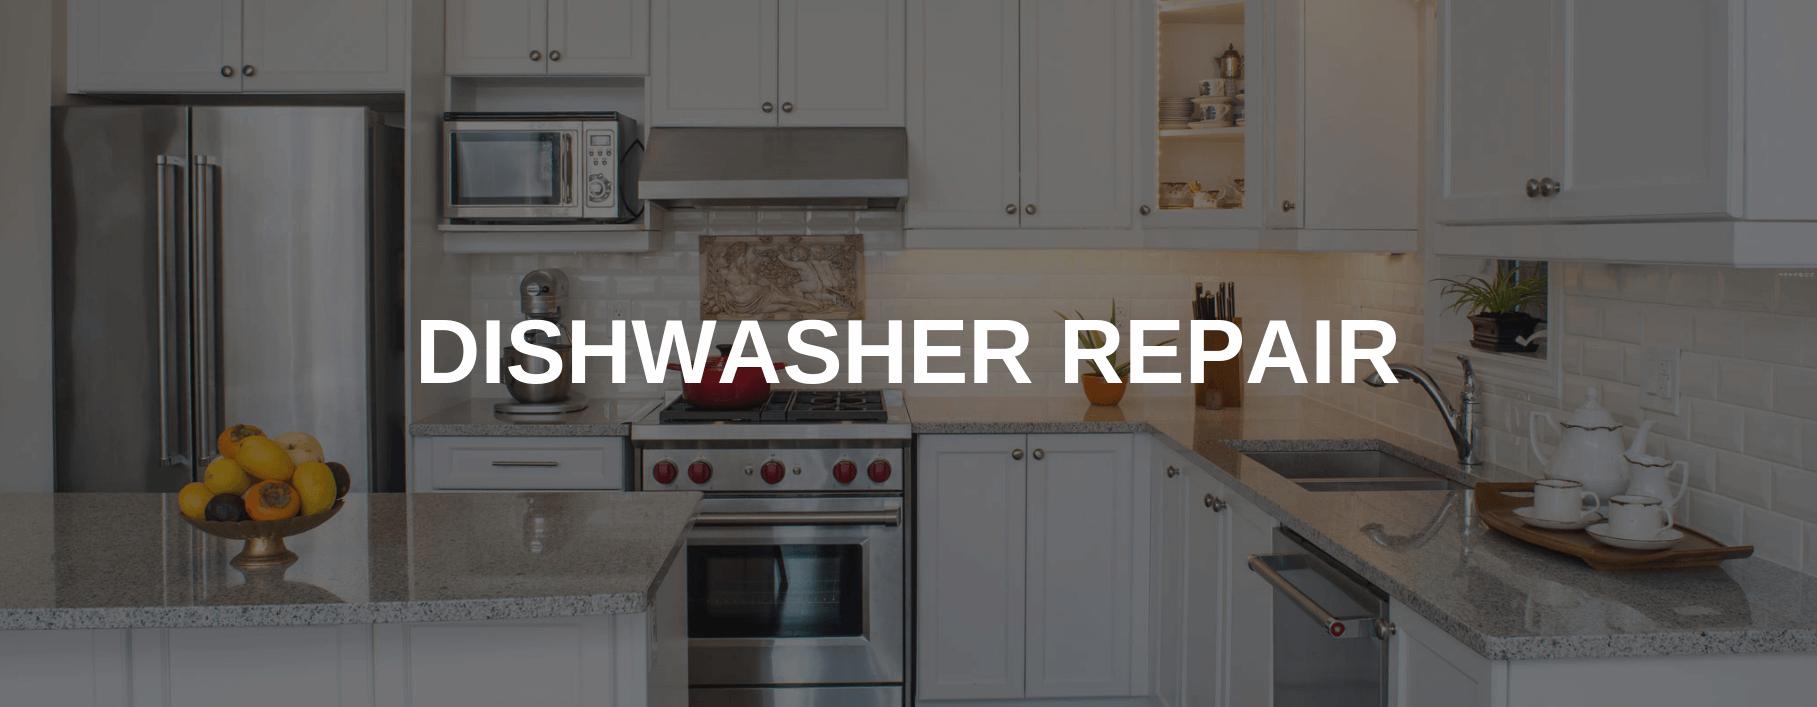 dishwasher repair worcester